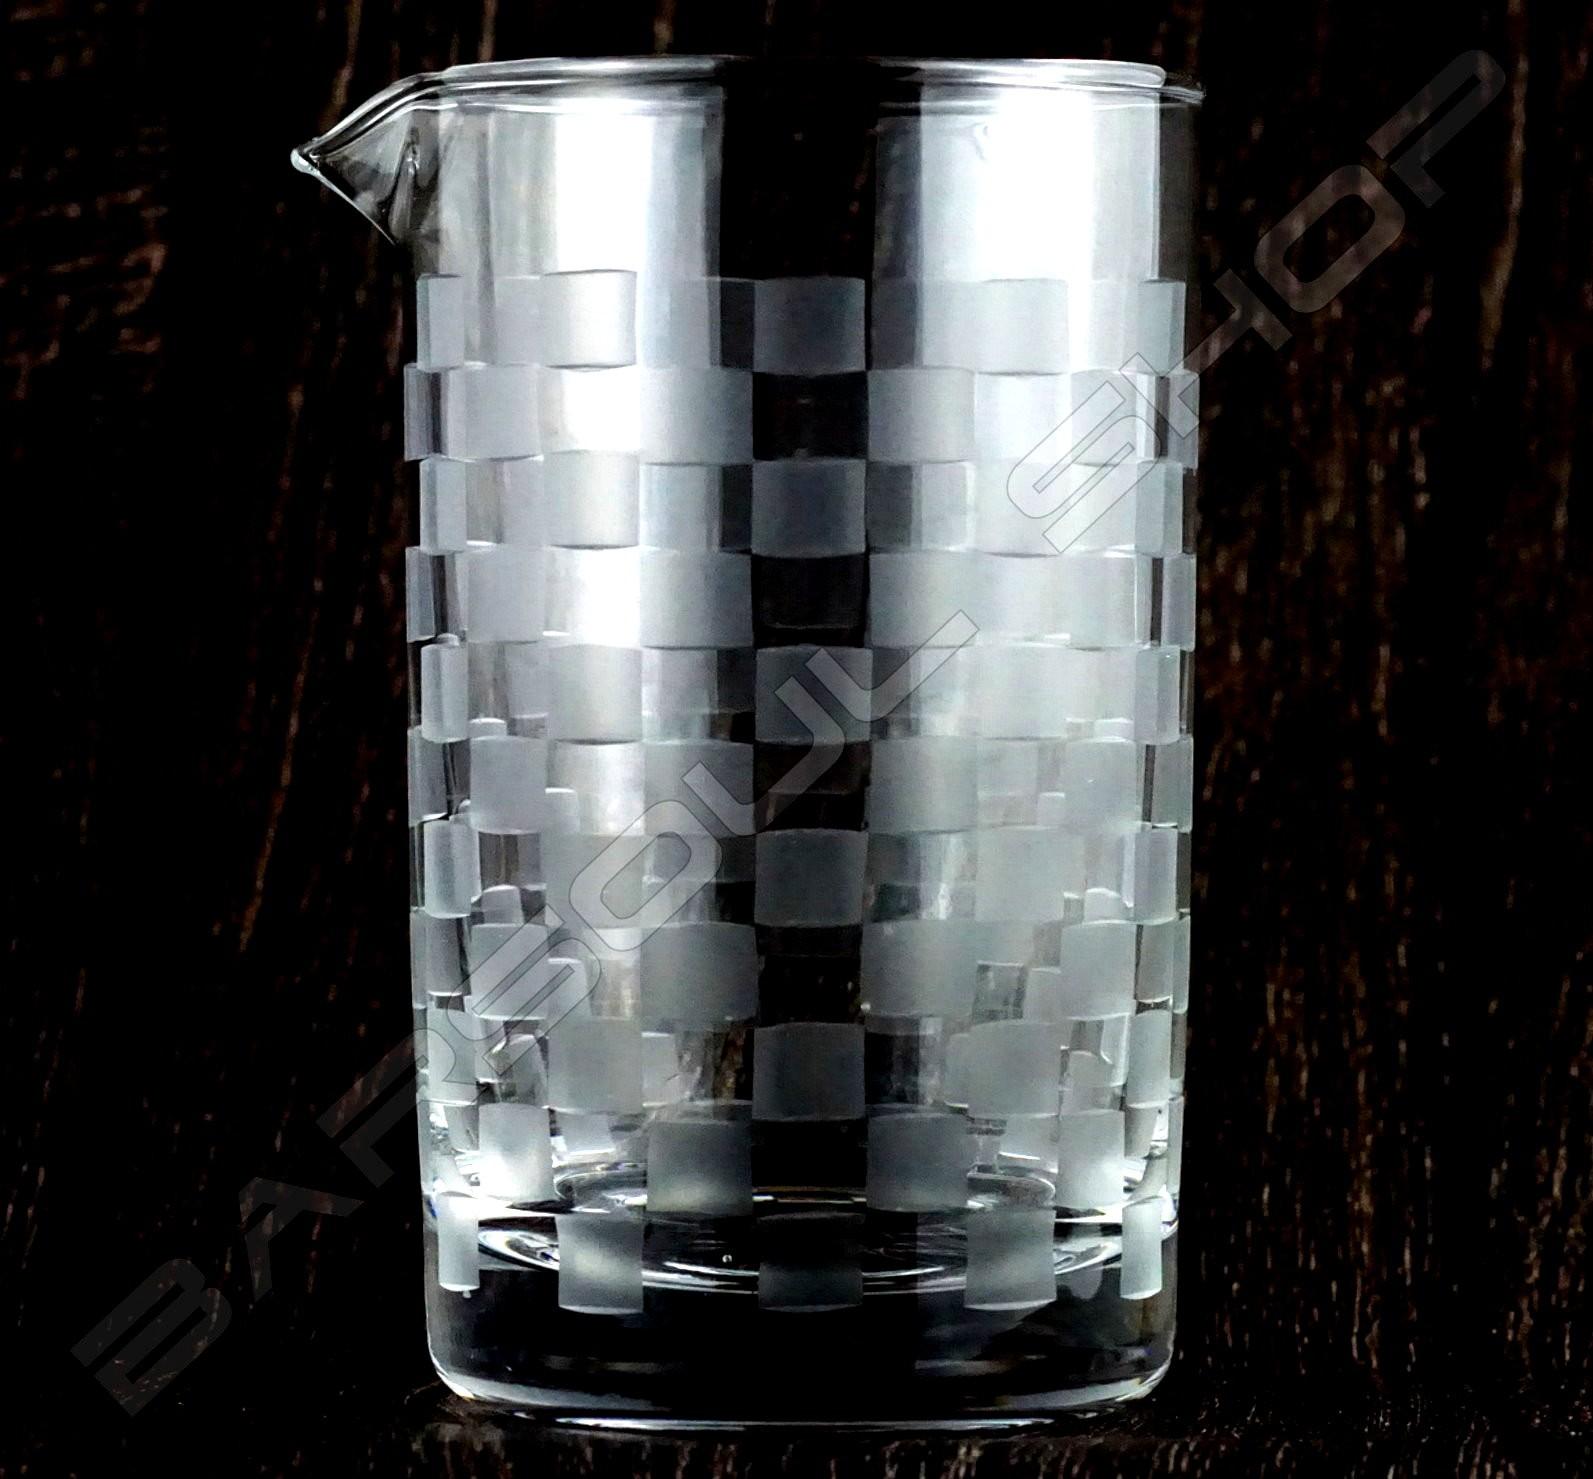 水晶攪拌杯 馬賽款A 630ml Crystal mixing glass (Mosaic A) H15cm